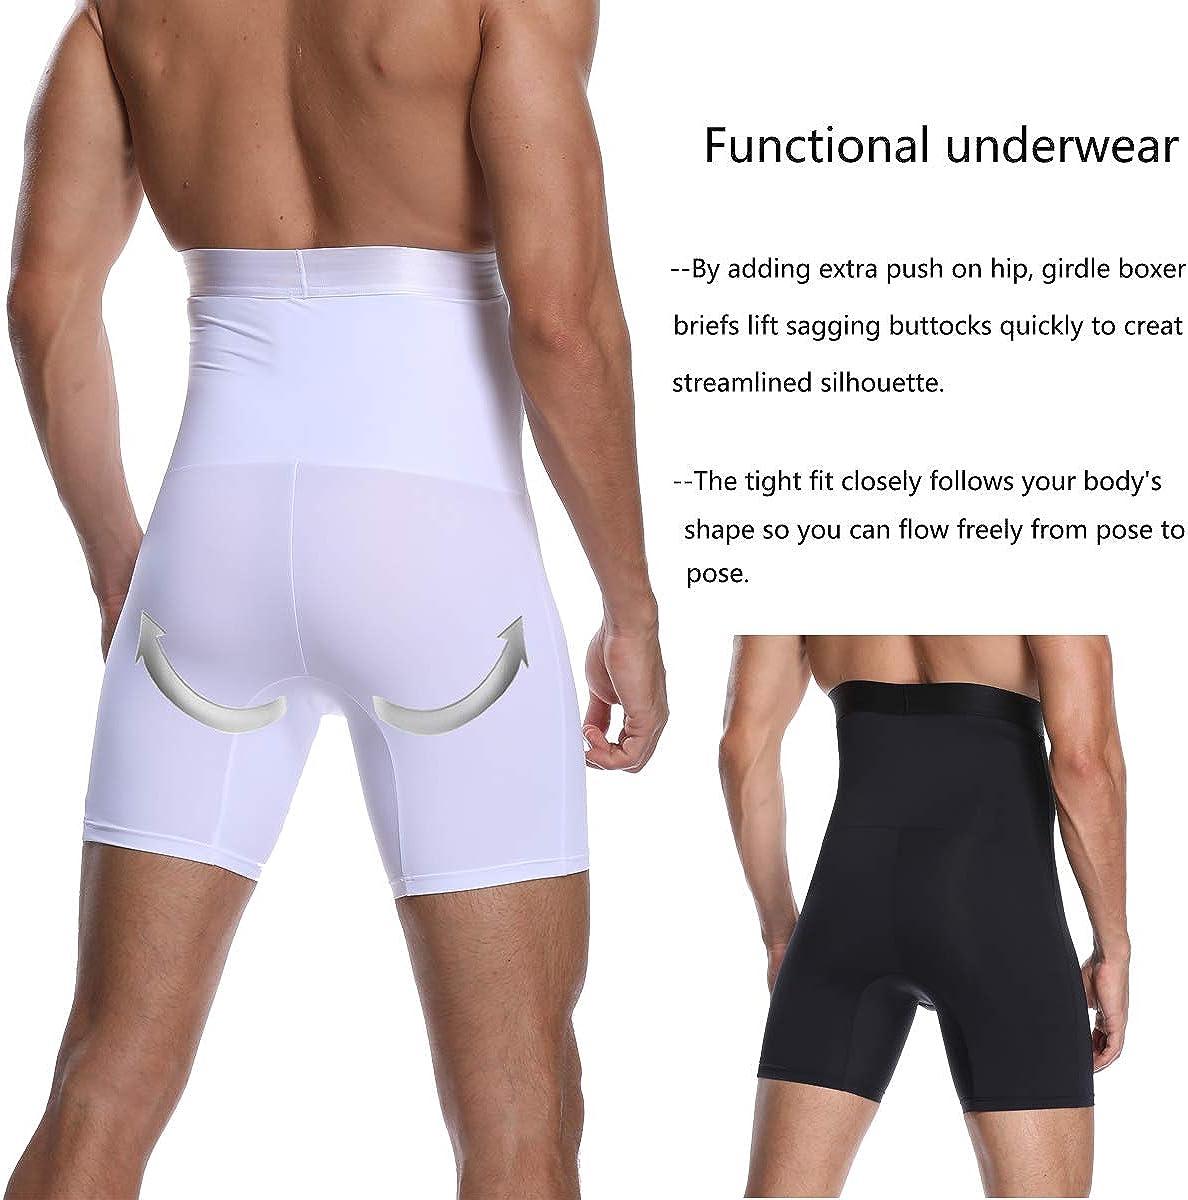 Mens Boxers Tummy Control Body Shaper Waist Trainer High Waist Slimming Pants Shapewear Shorts Underwear Briefs